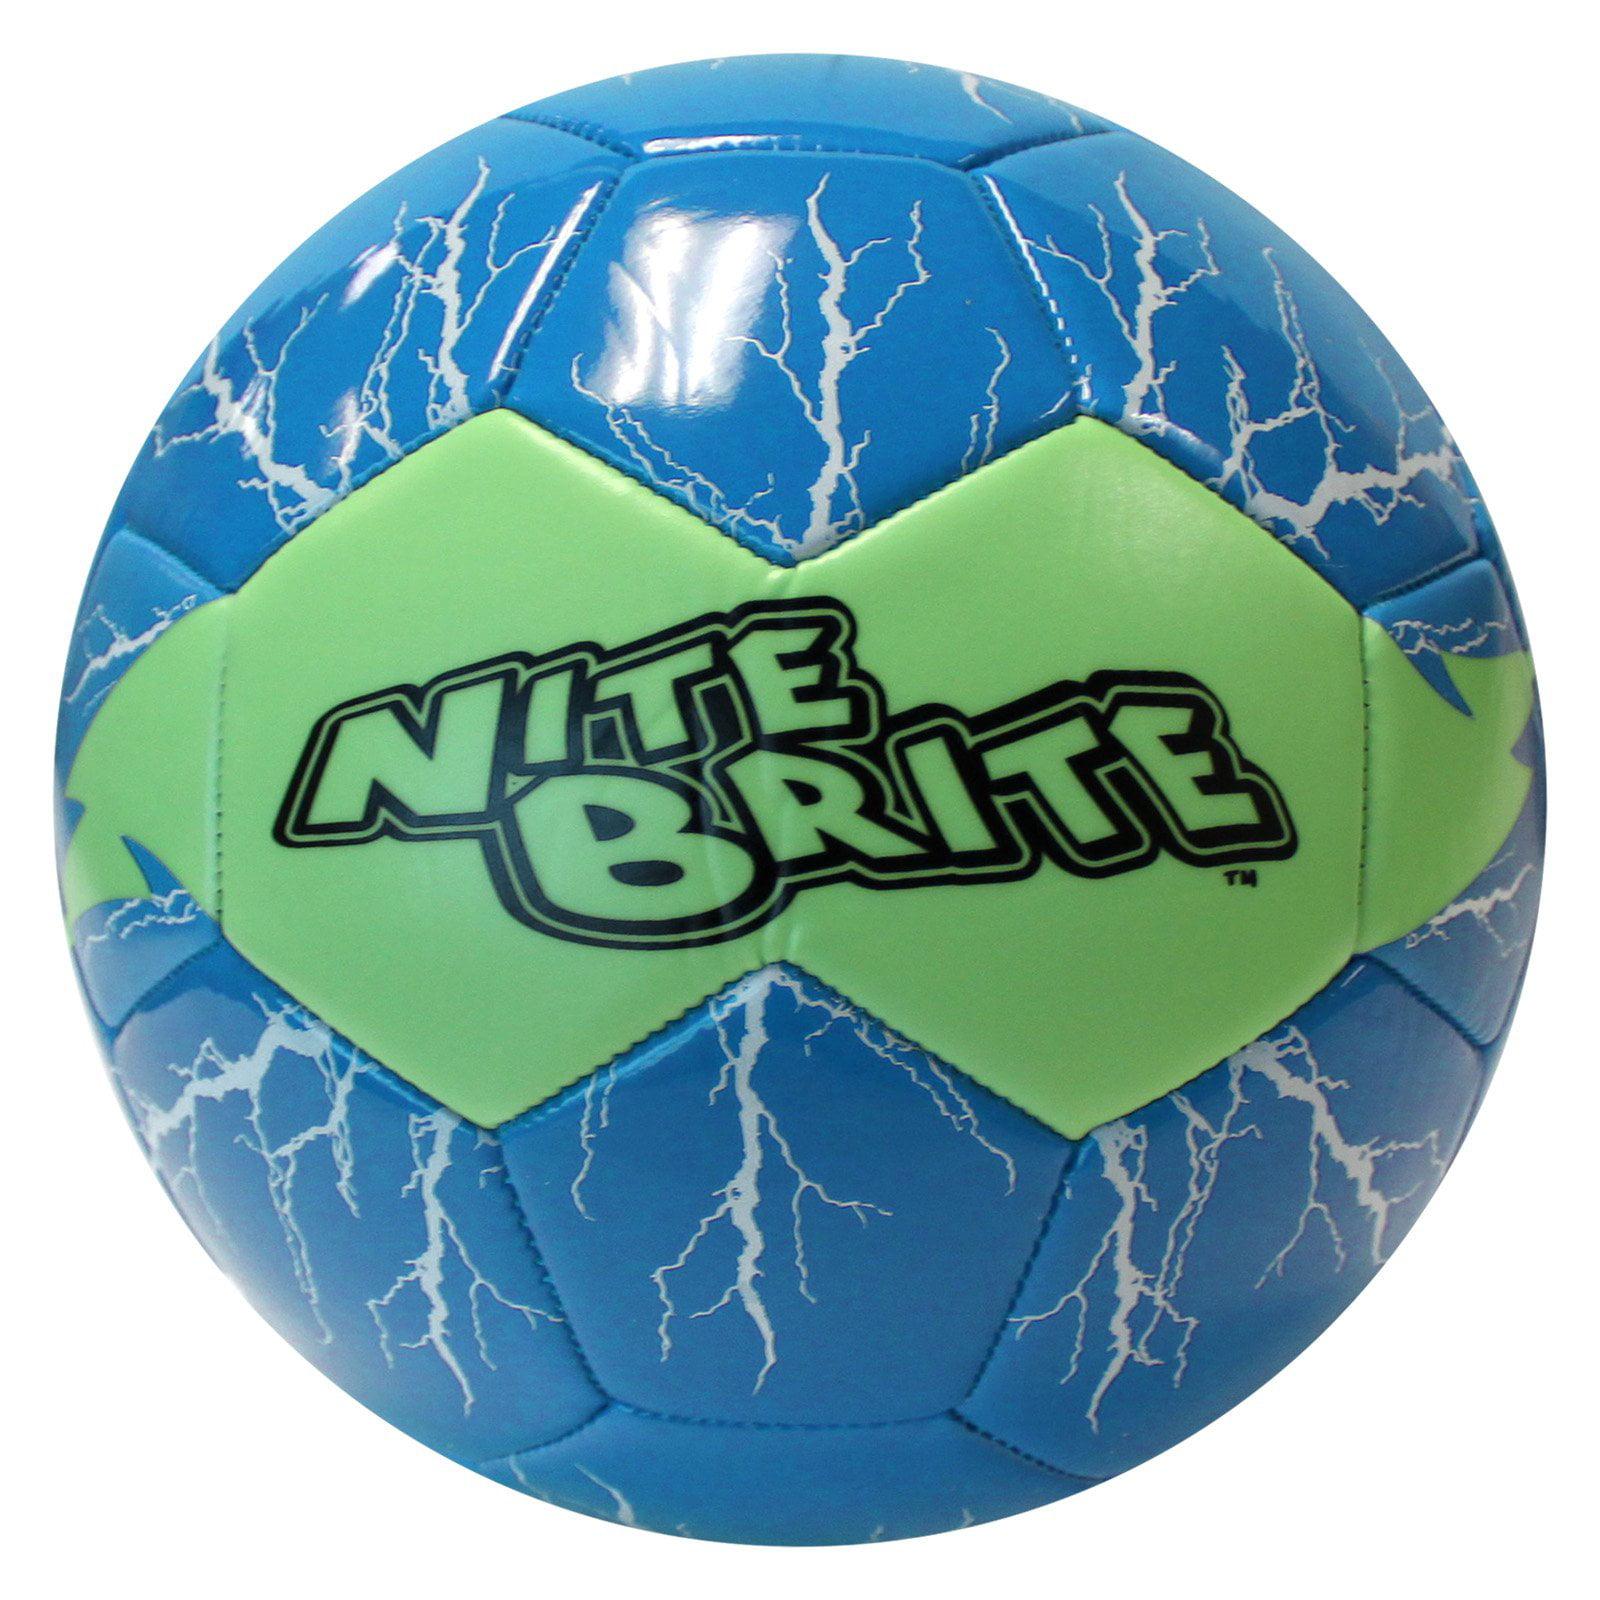 Baden Sports Blue Nite Brite Soccer Ball by Baden Sports Inc.